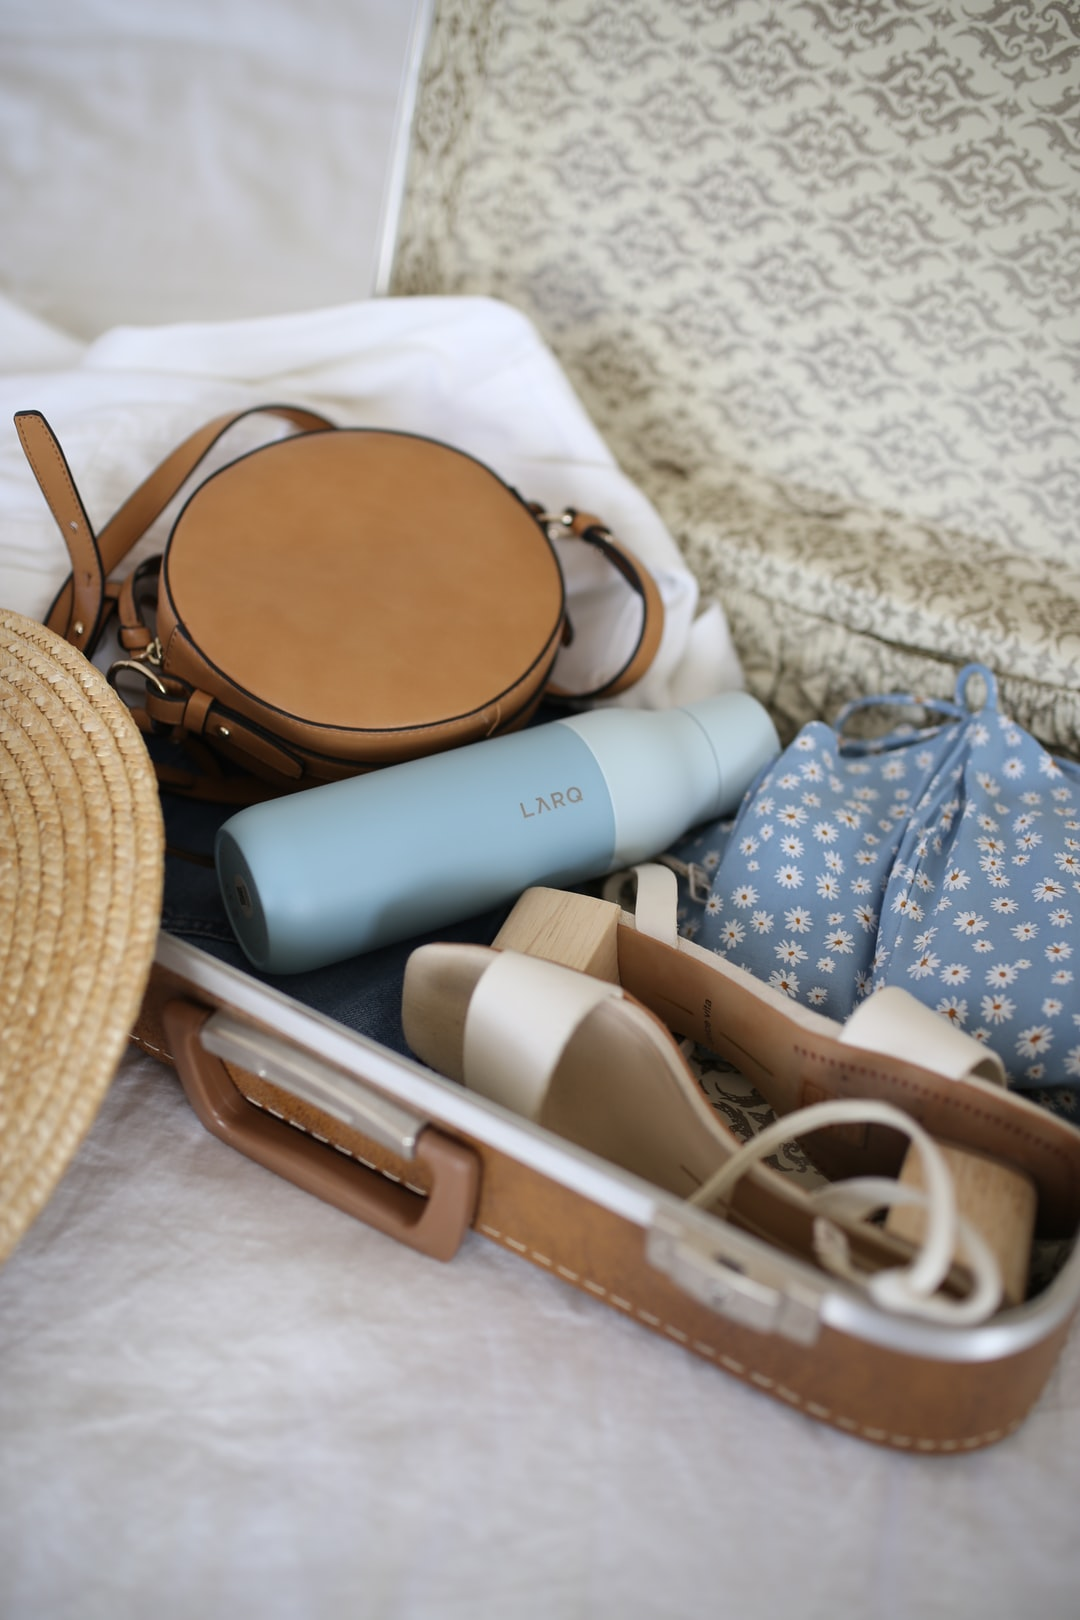 Summer travel essentials water bottle larq bottle packing for trip https://www.livelarq.com/water-bottle/